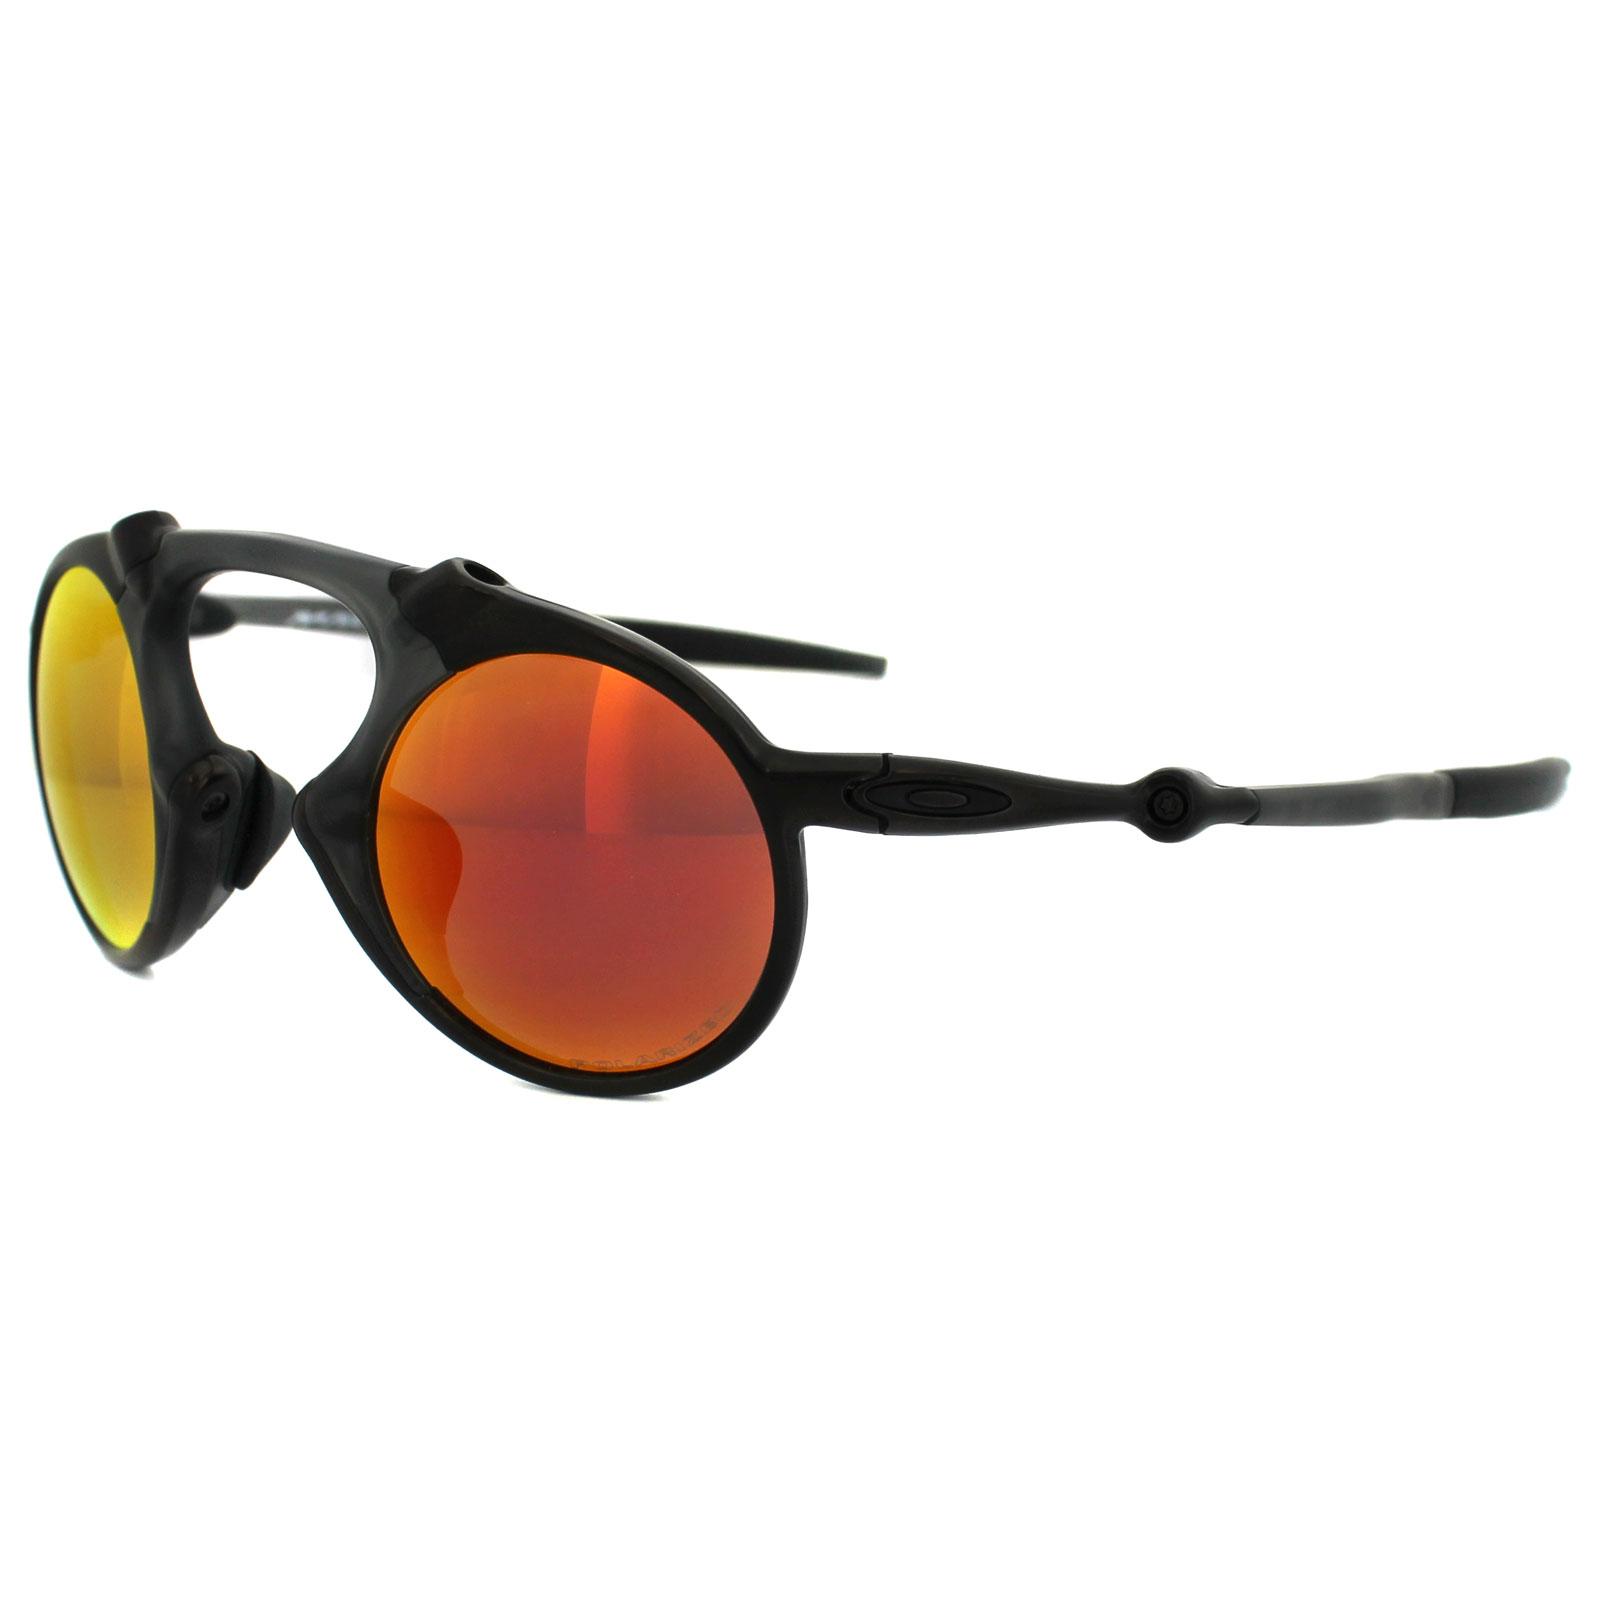 f31d65ba31 Sentinel Oakley Sunglasses Madman OO6019-04 Dark Carbon Ruby Iridium  Polarized